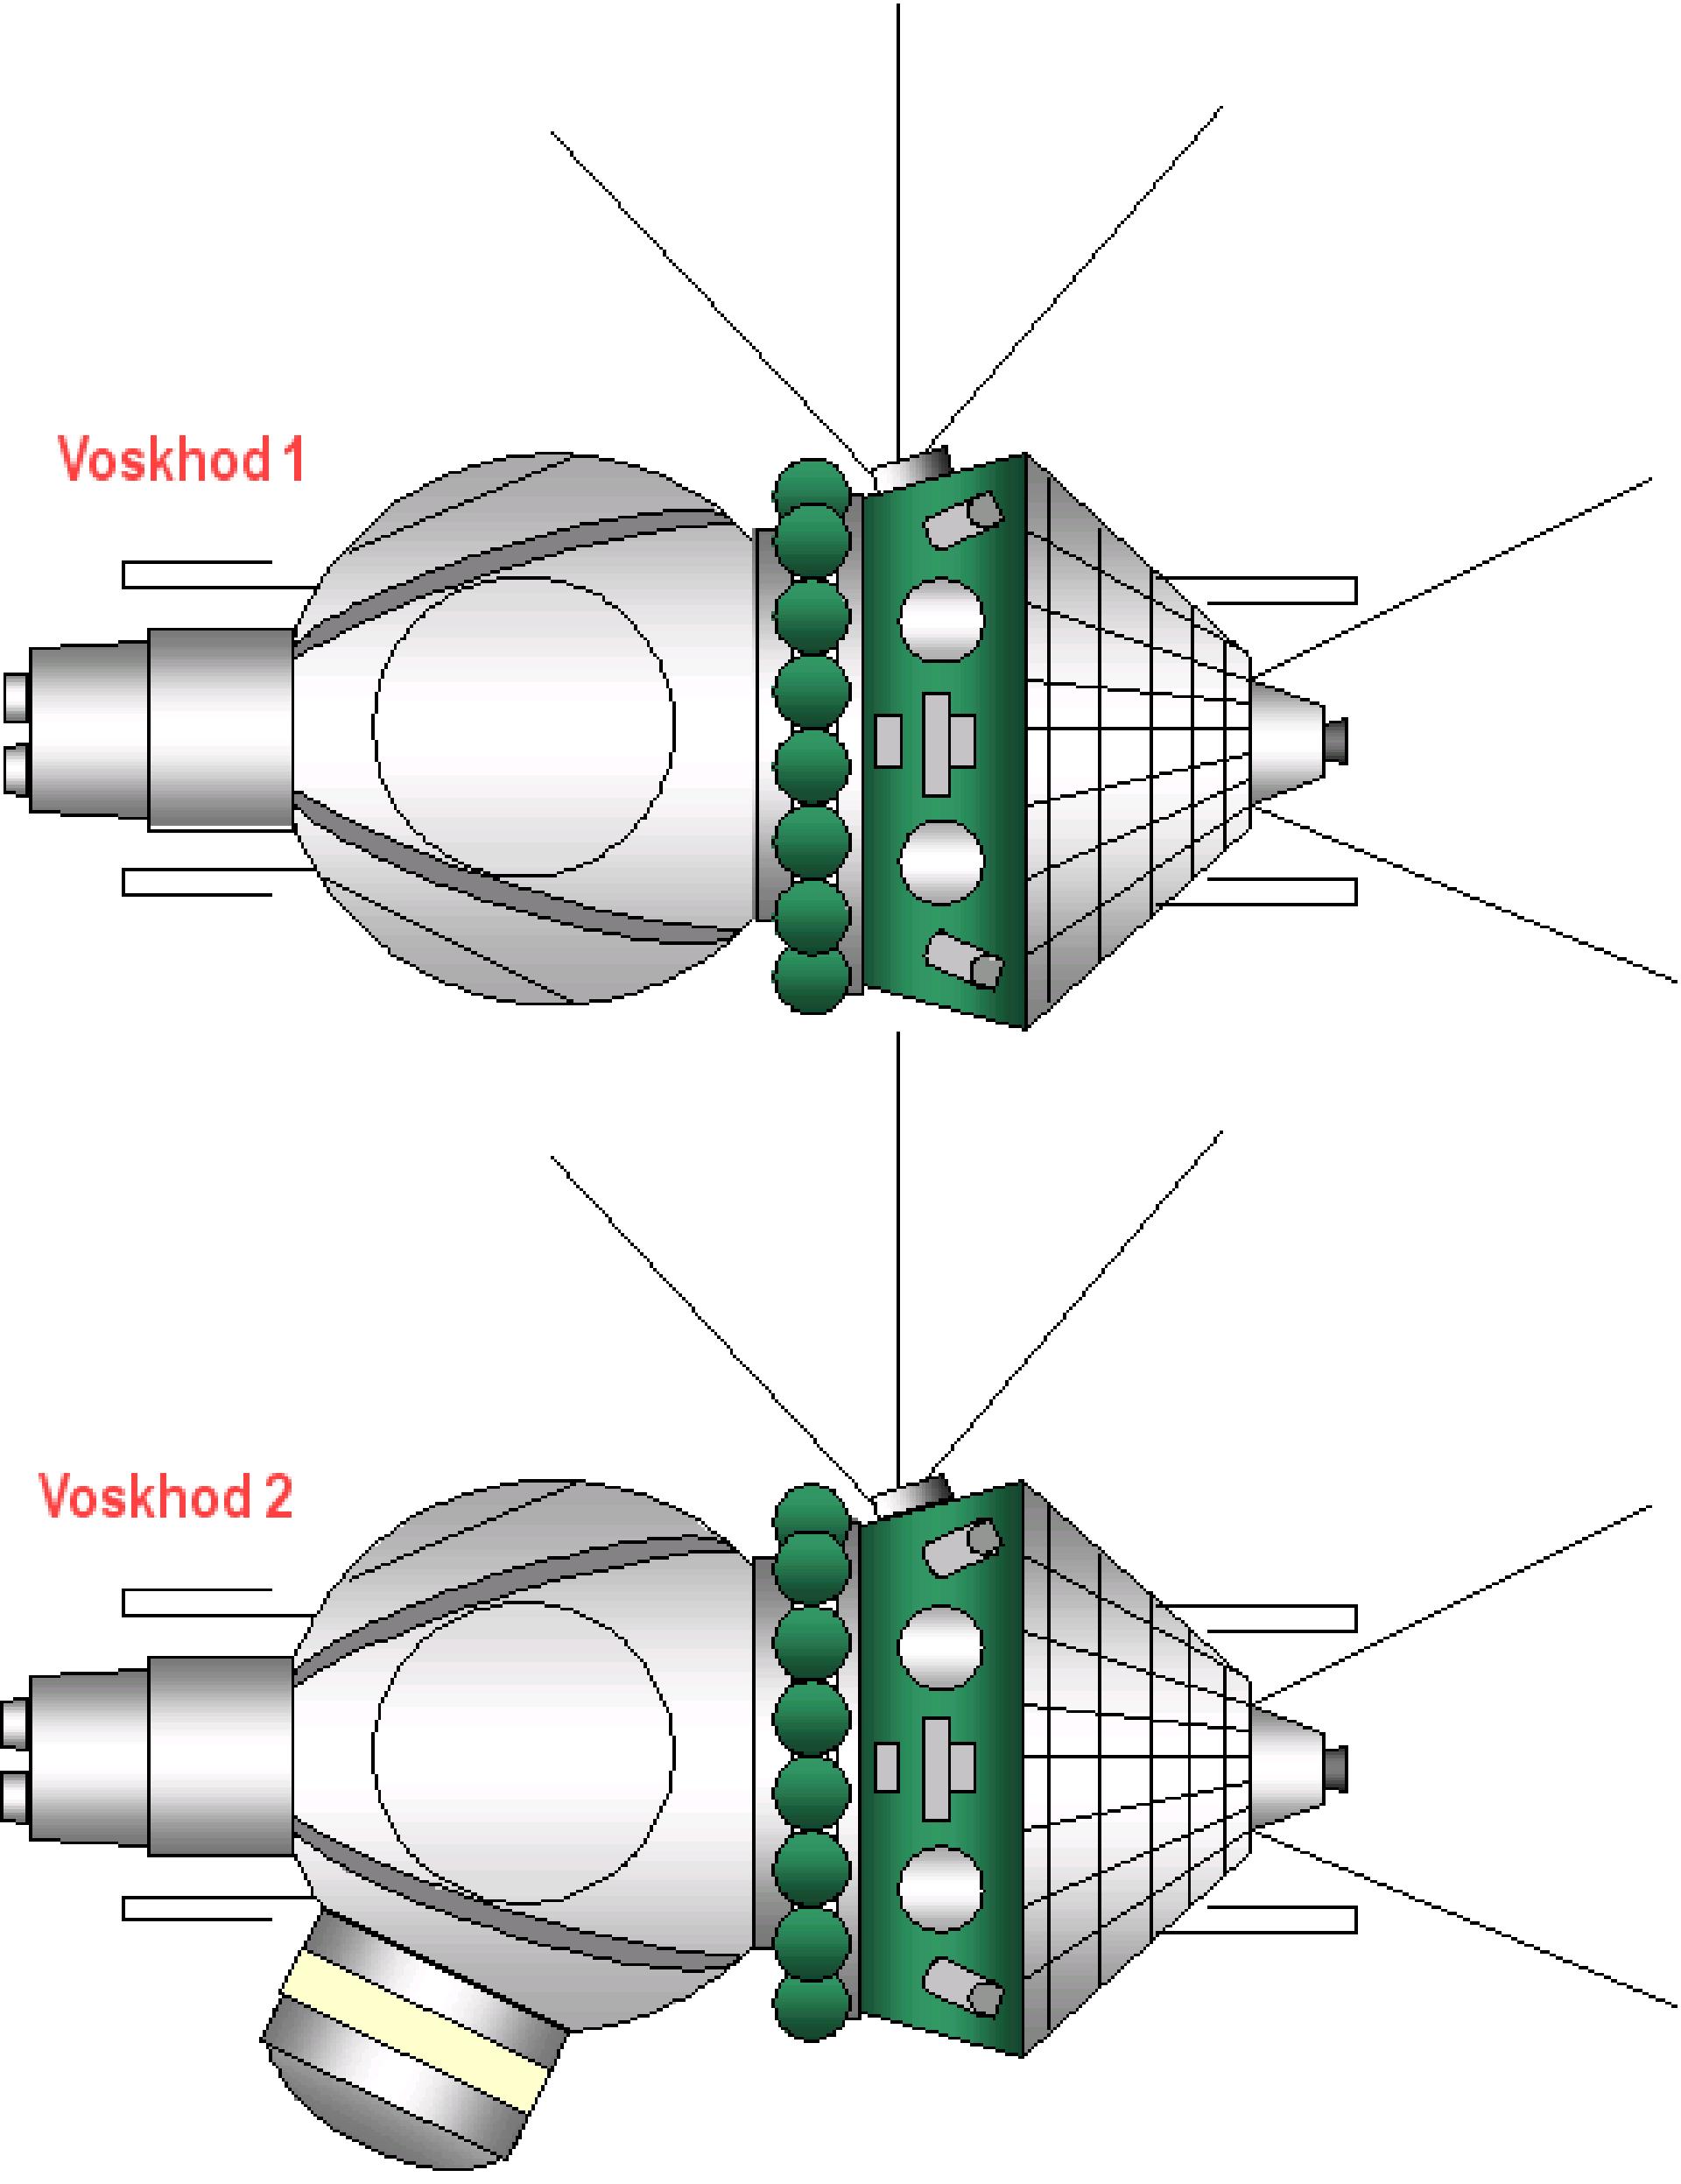 image of Voskhod